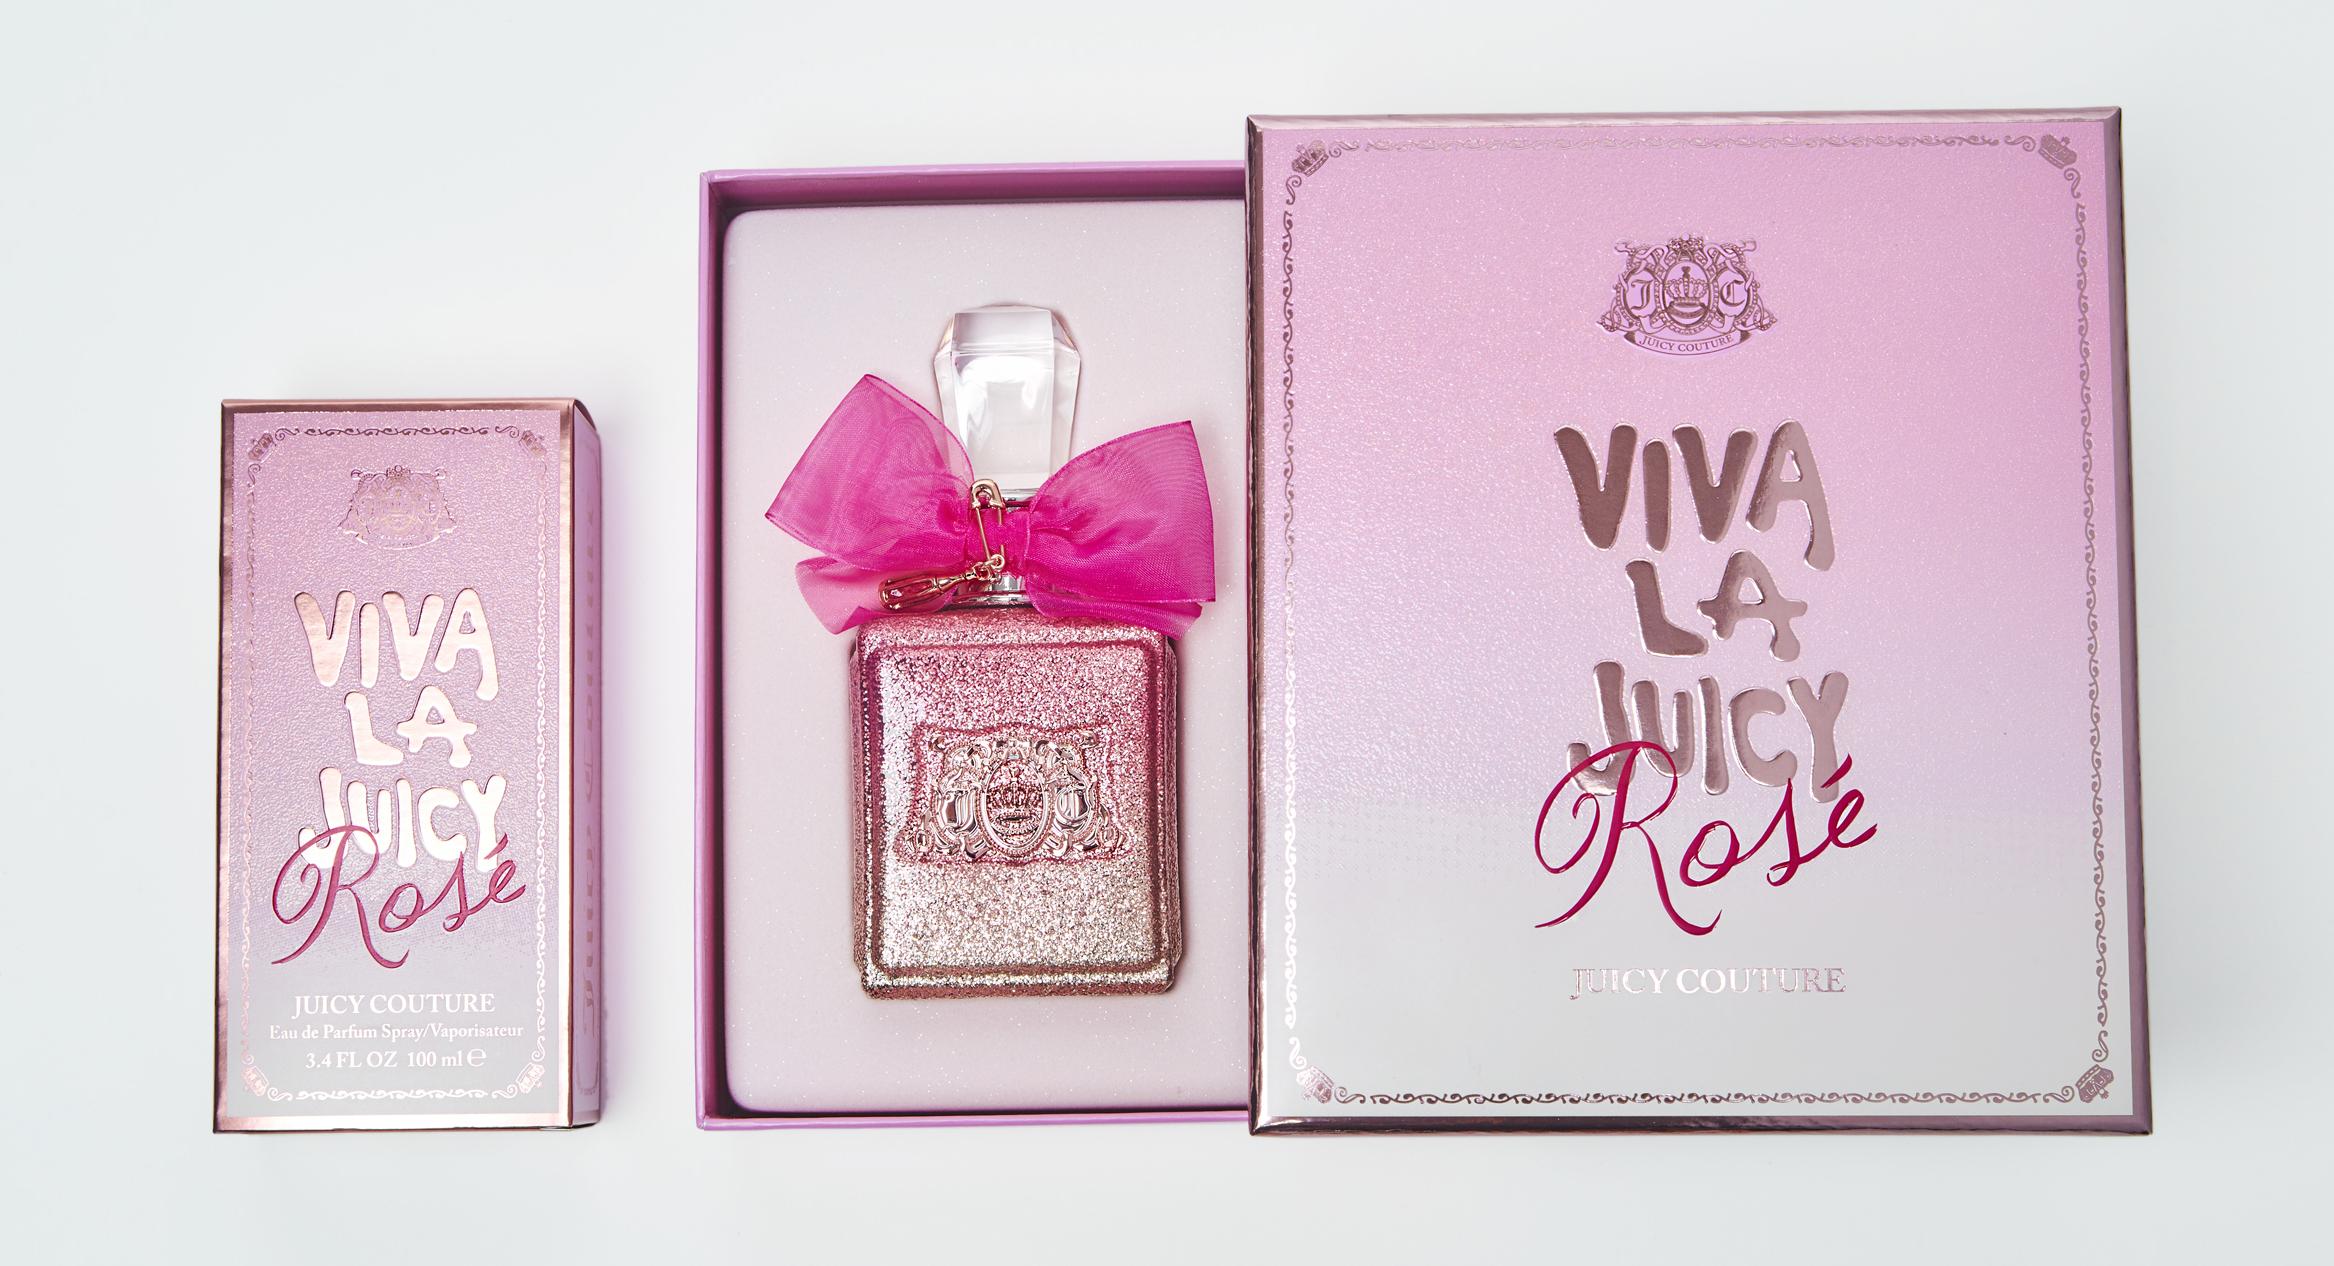 Viva la Juicy Rose - Ombre Glitter Carton & Gift Set